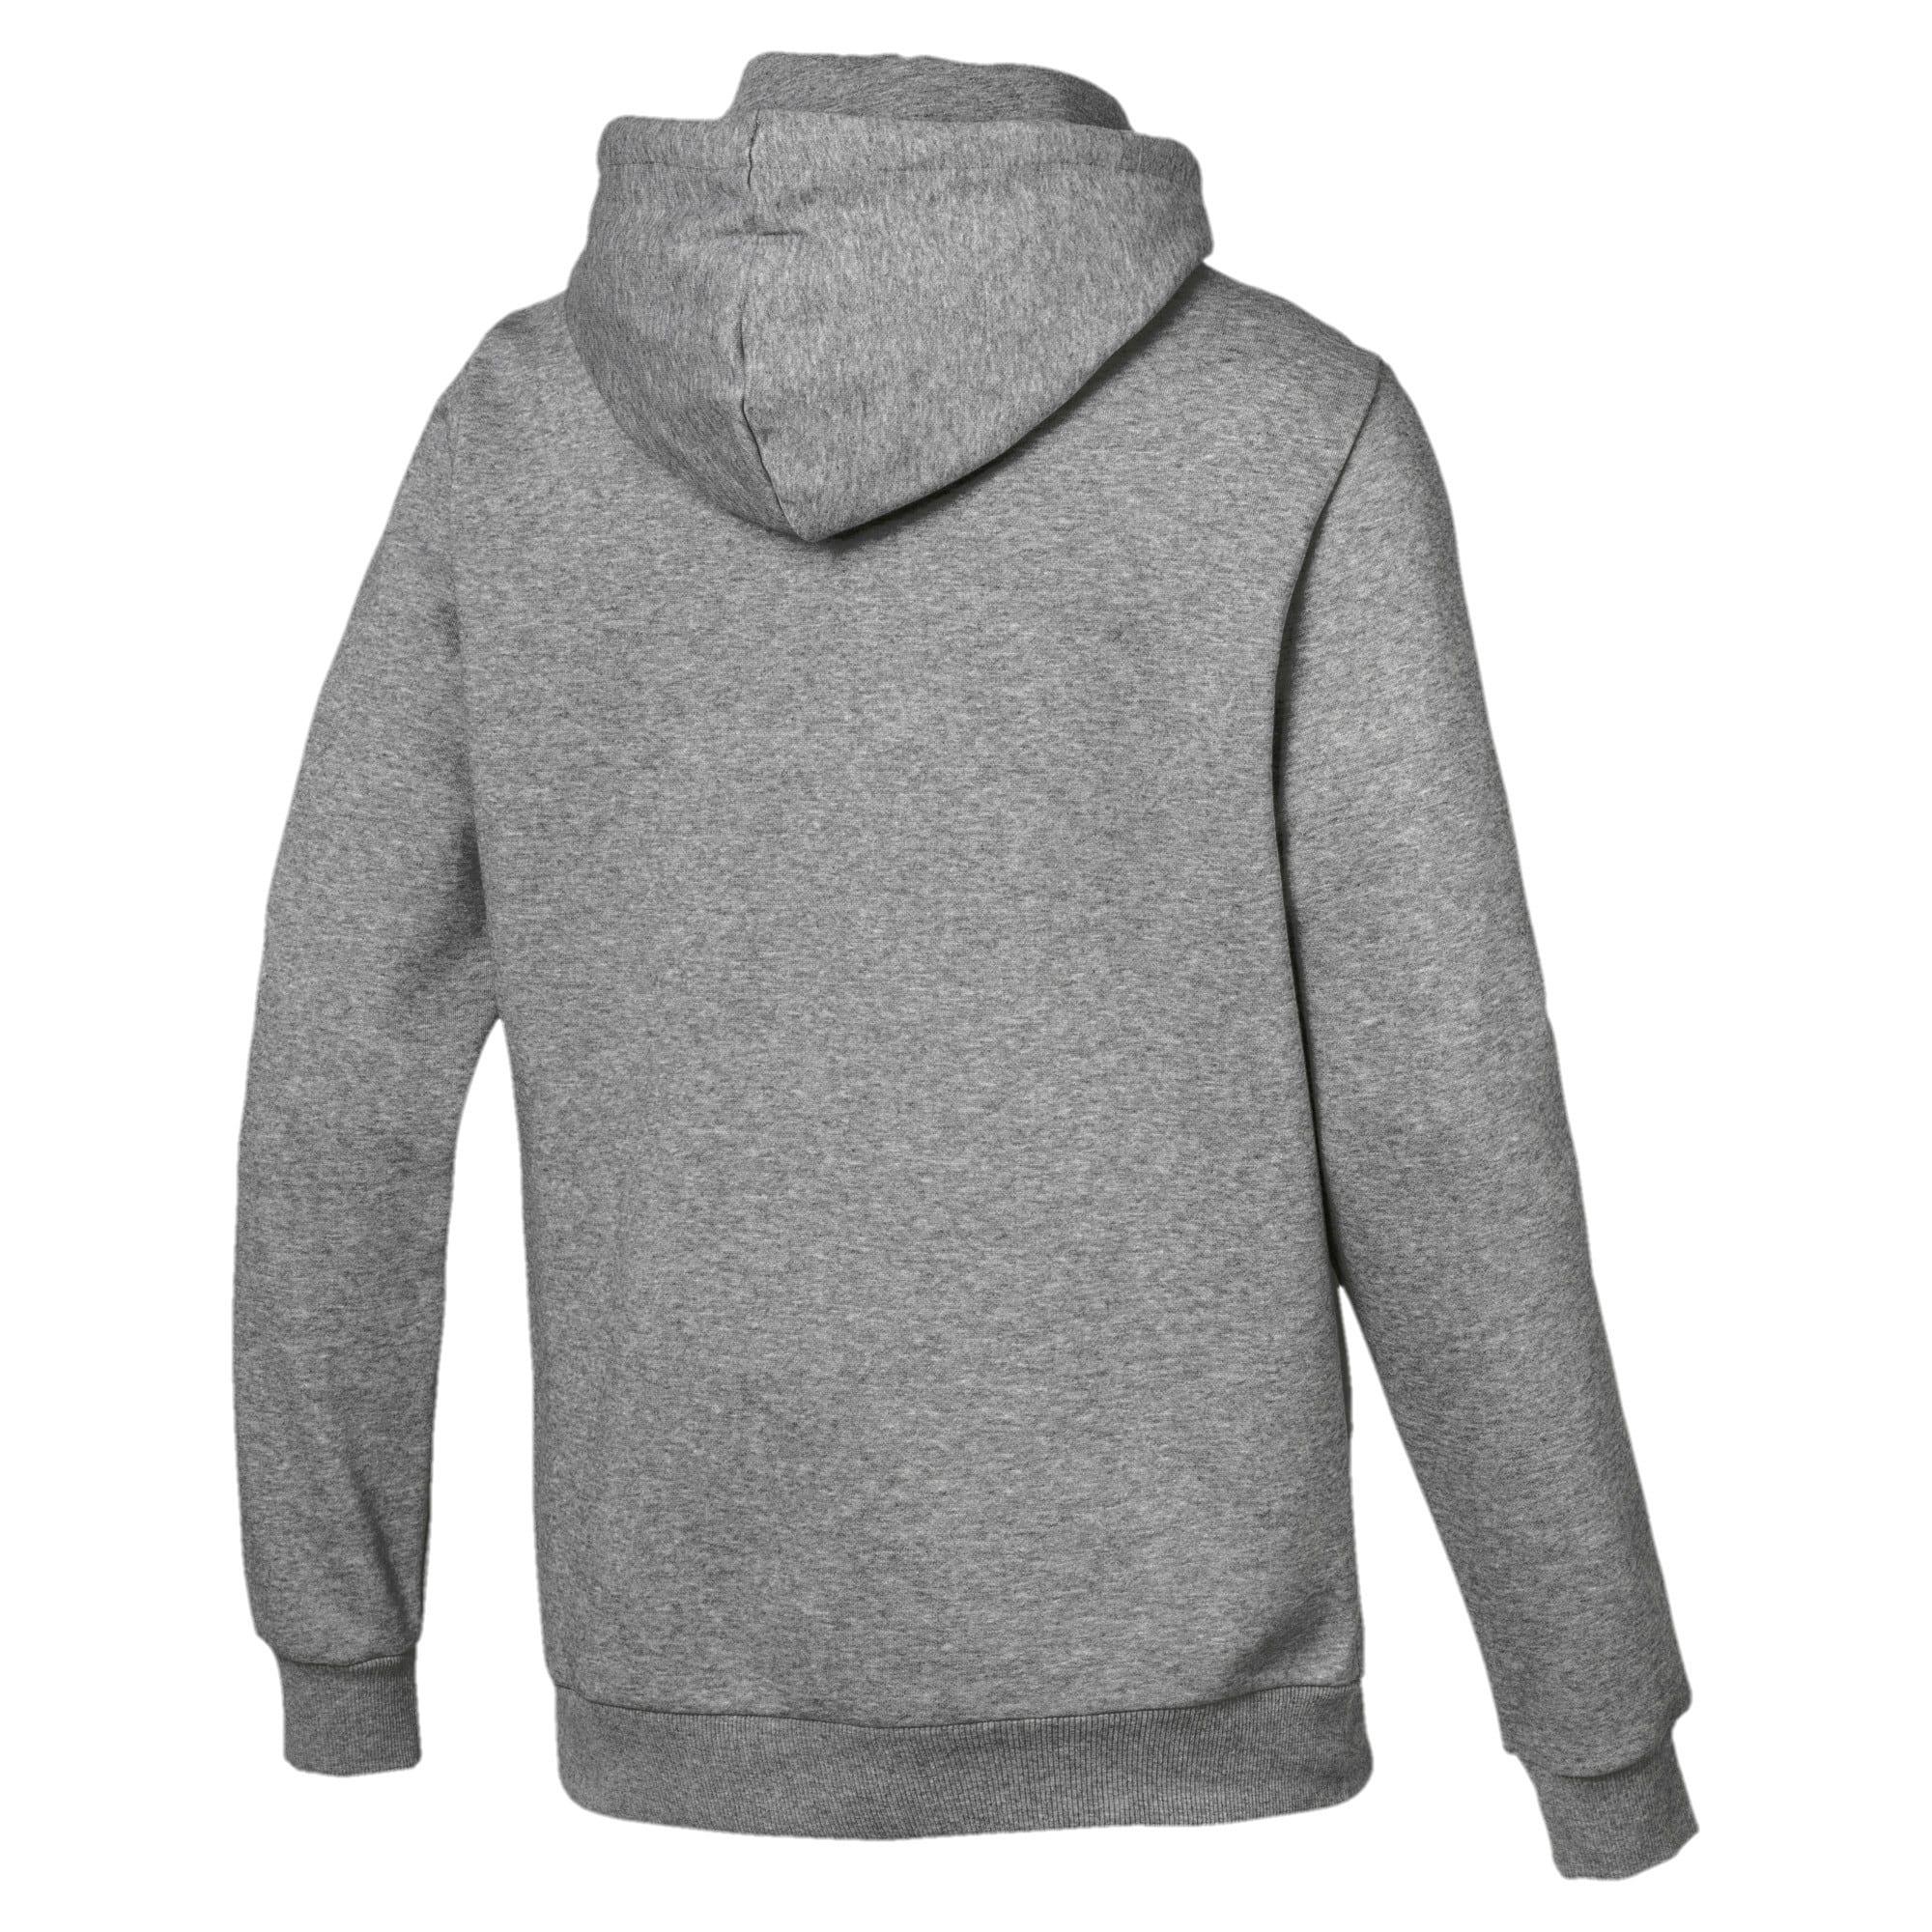 Thumbnail 5 of Essentials Fleece Men's Hoodie, Medium Gray Heather, medium